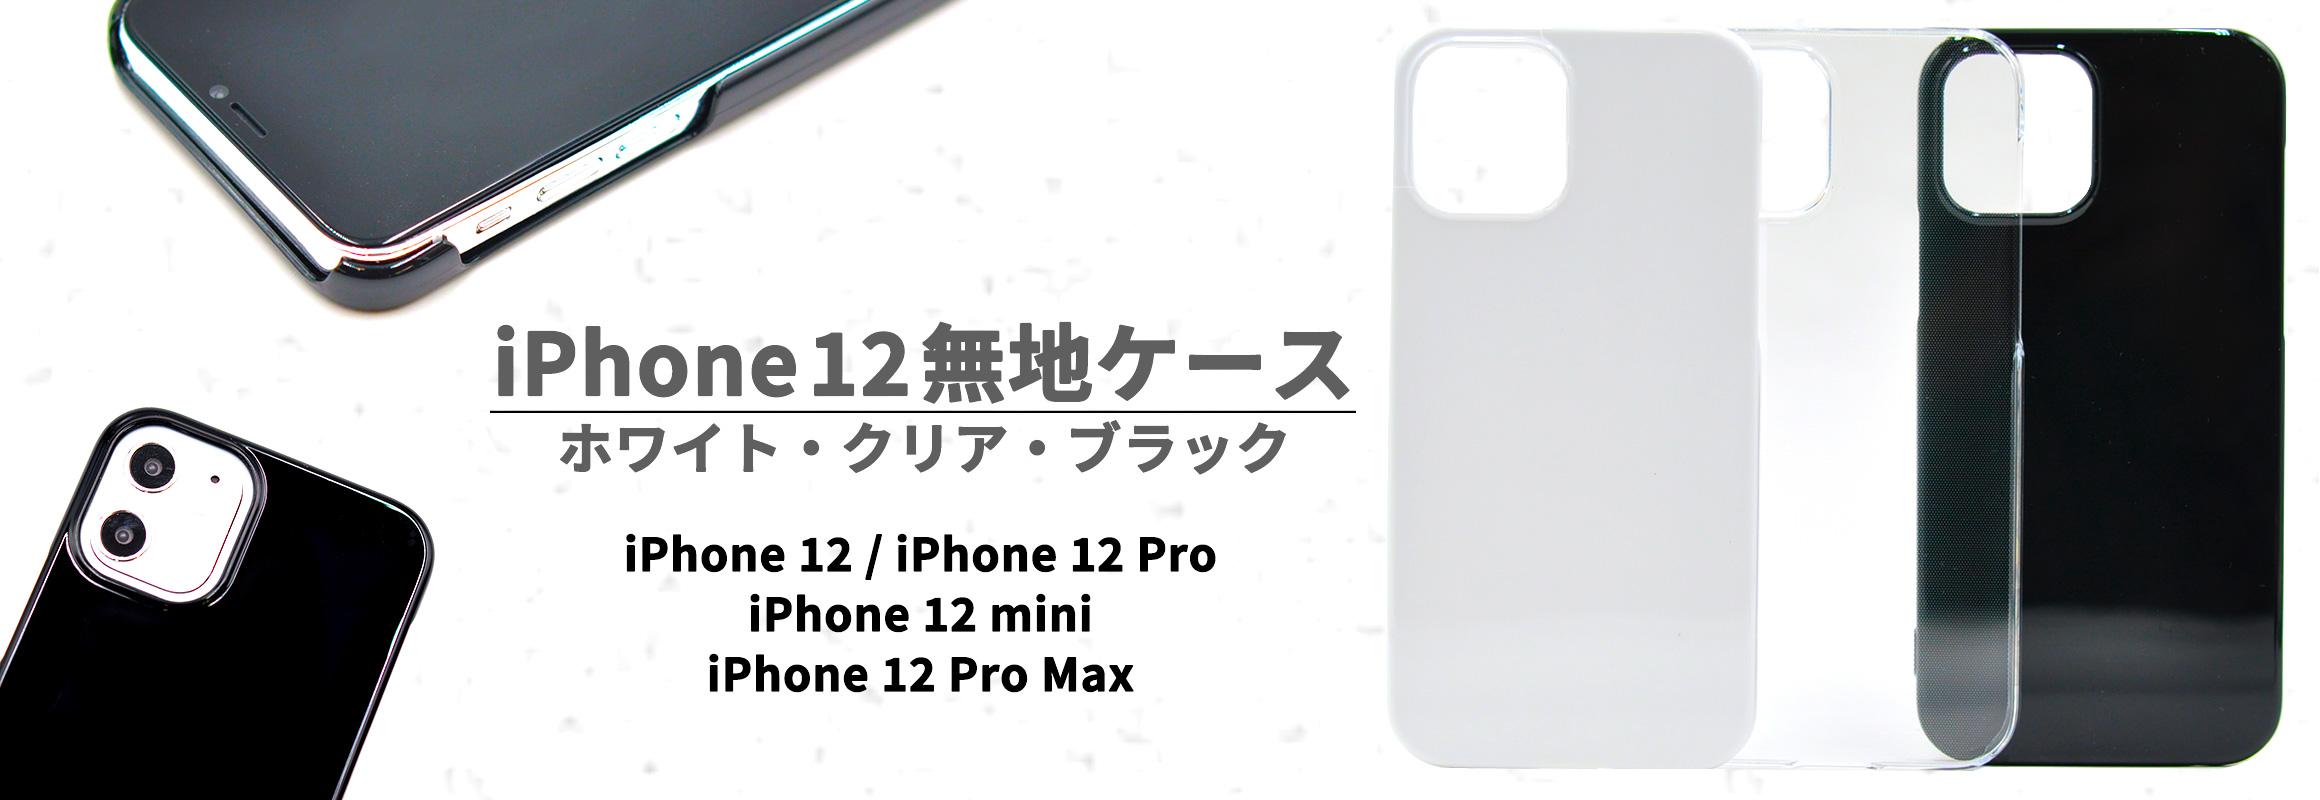 iPhone12 無地ケース